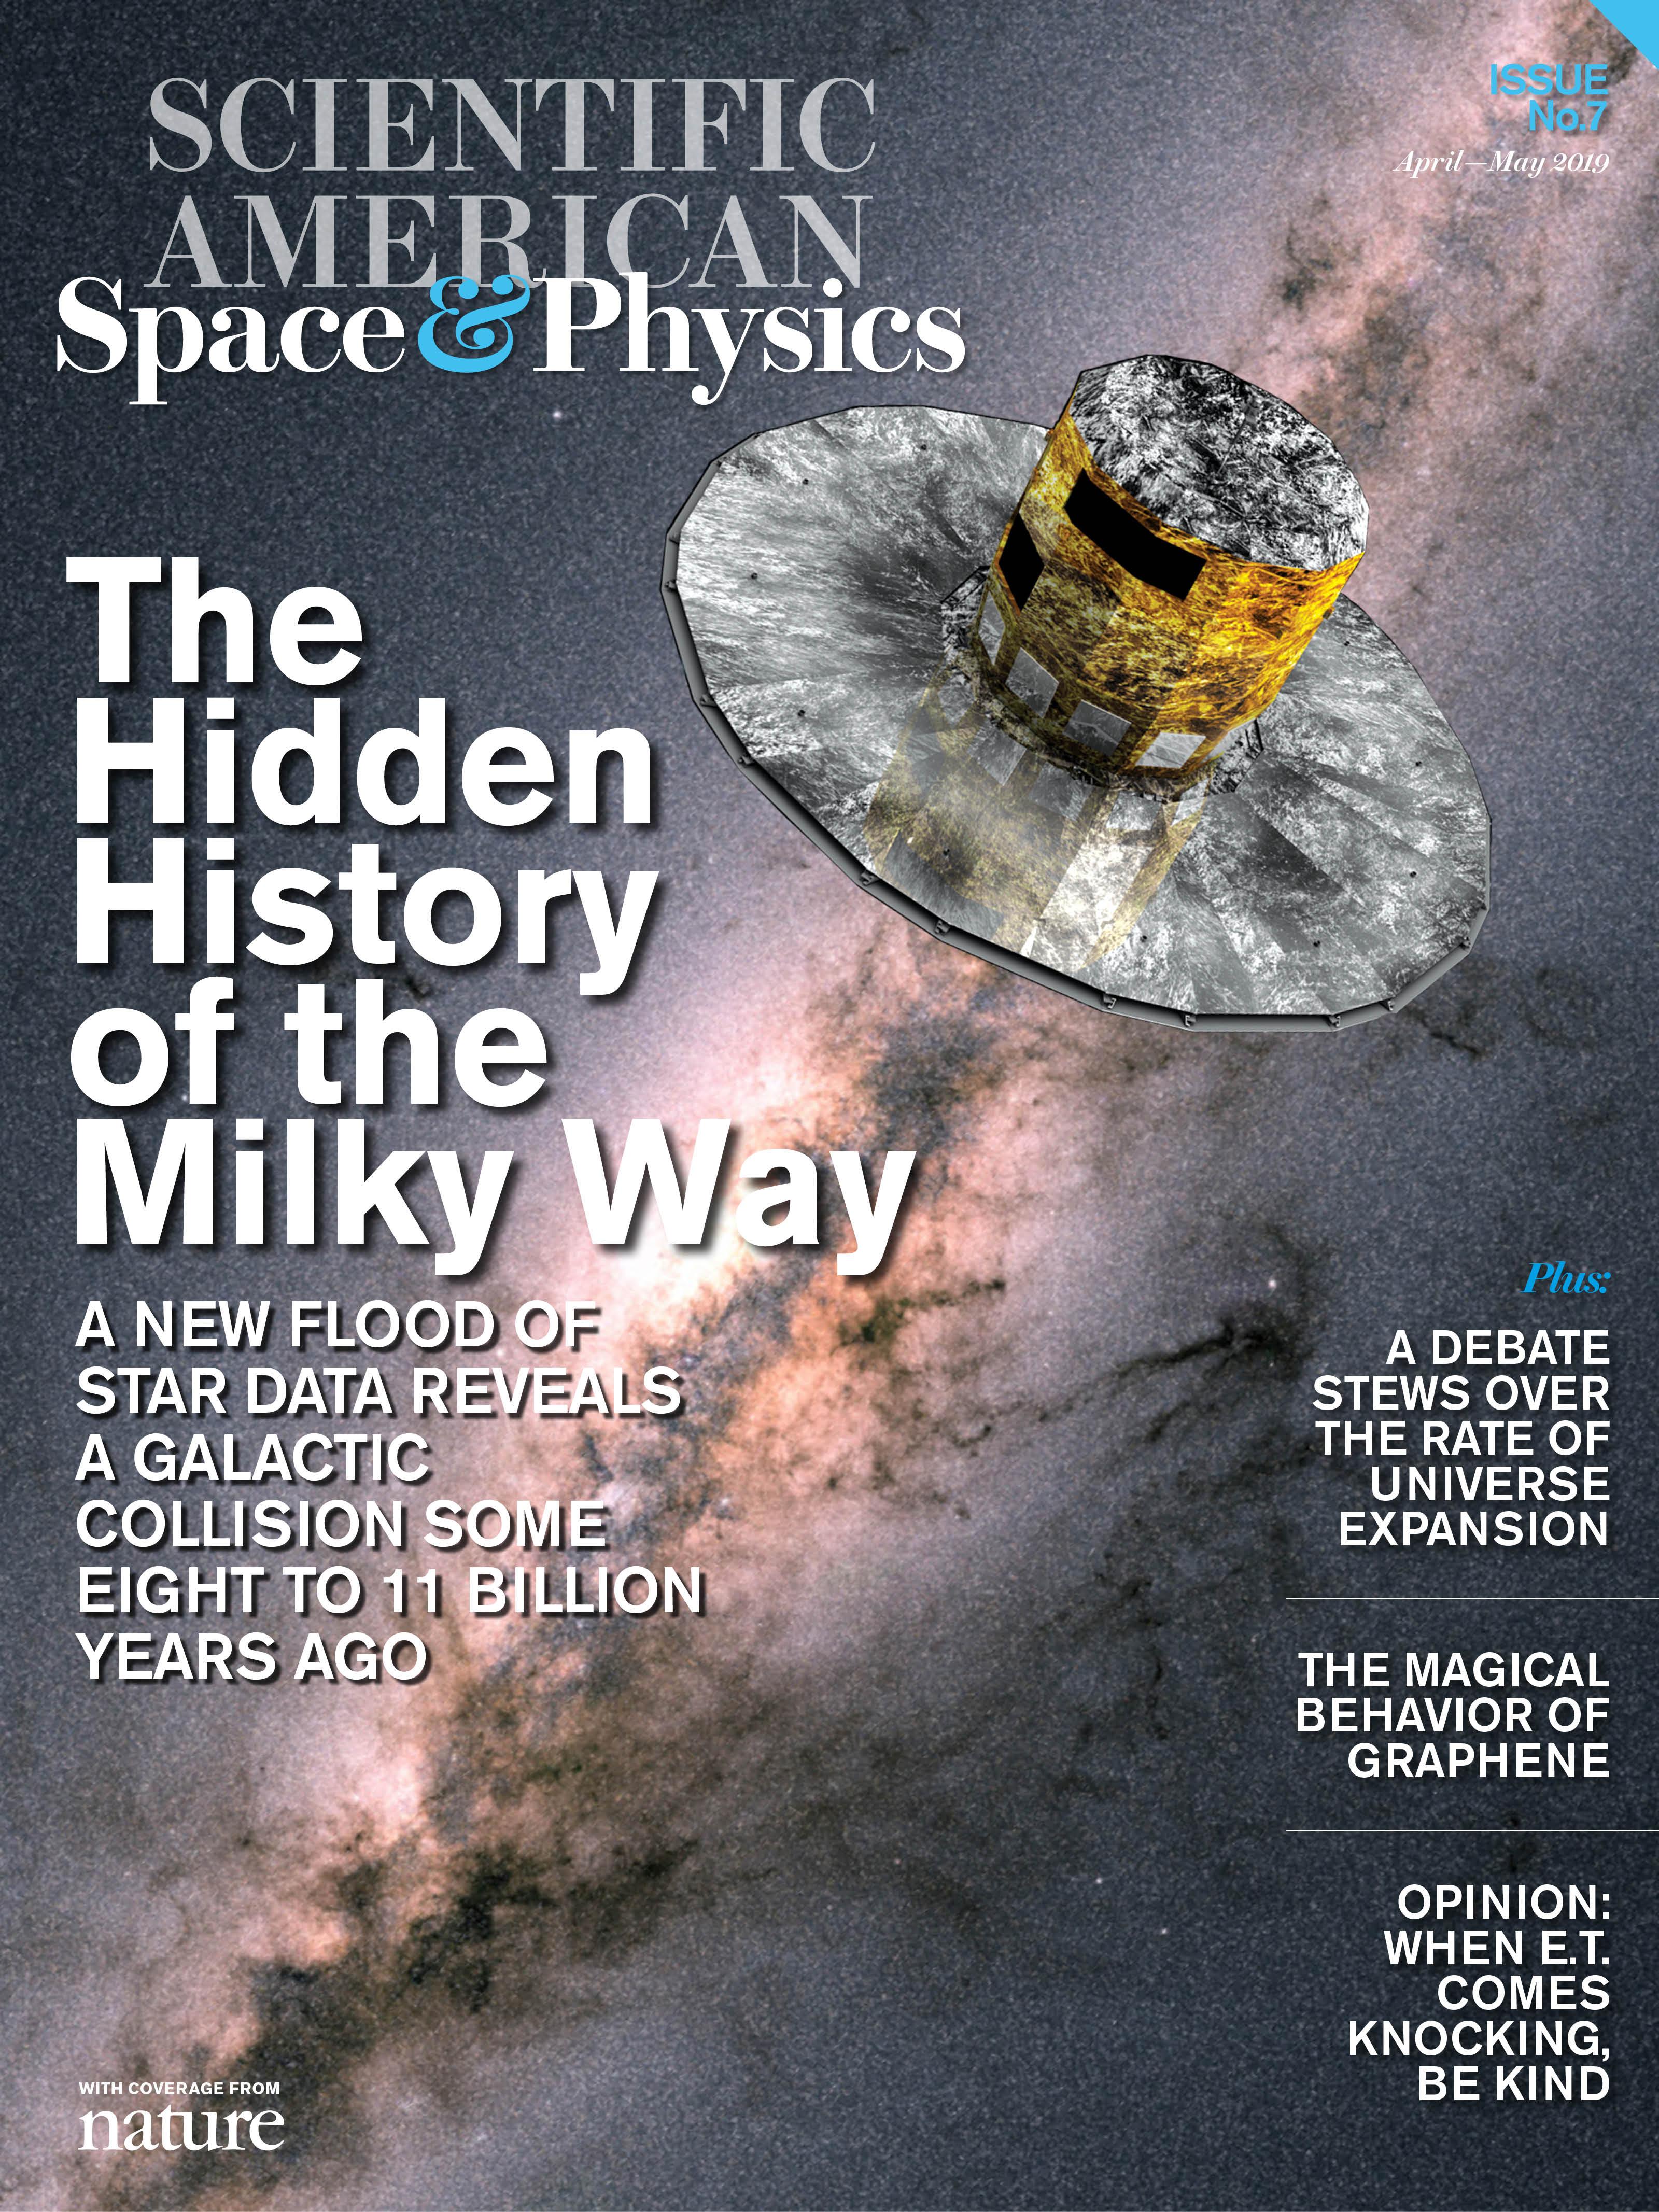 Scientific American Space & Physics, Volume 2, Issue 2